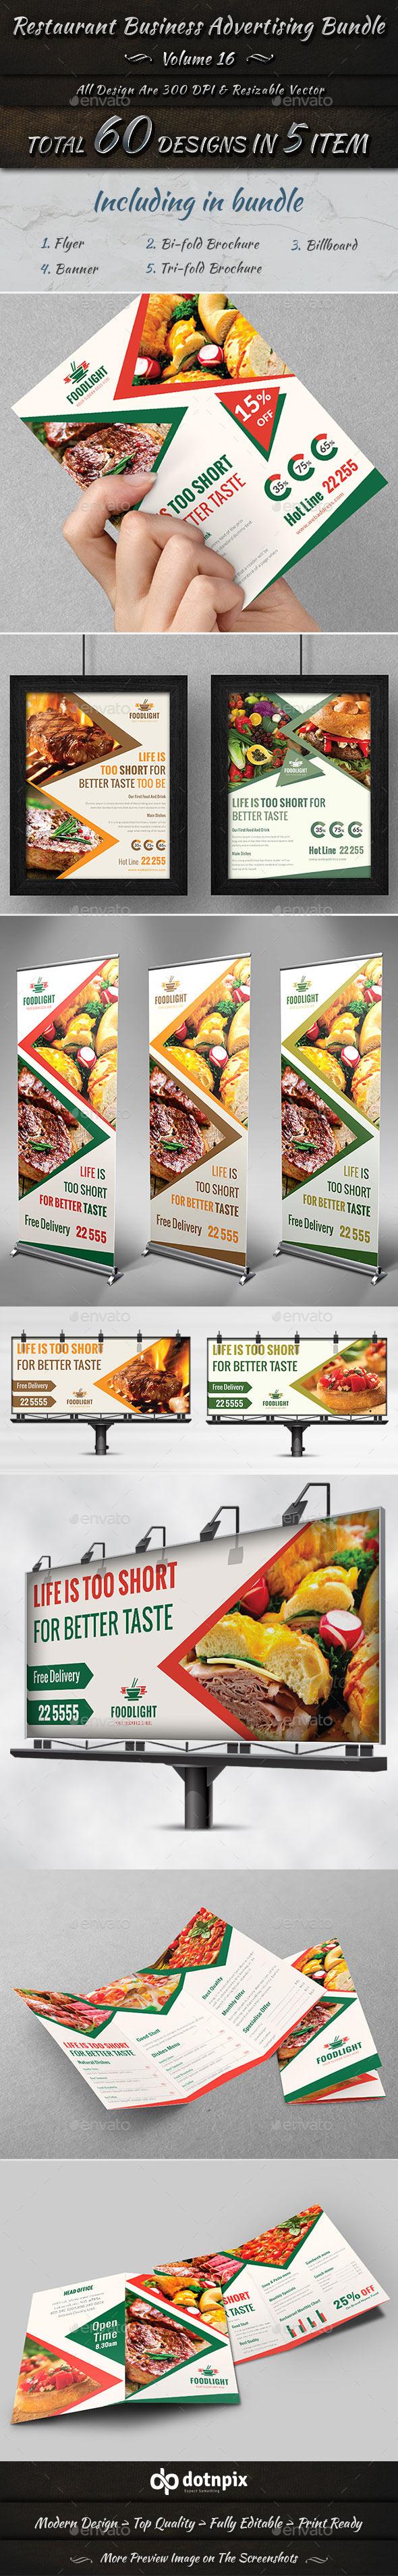 Restaurant Business Advertising Bundle Volume 16